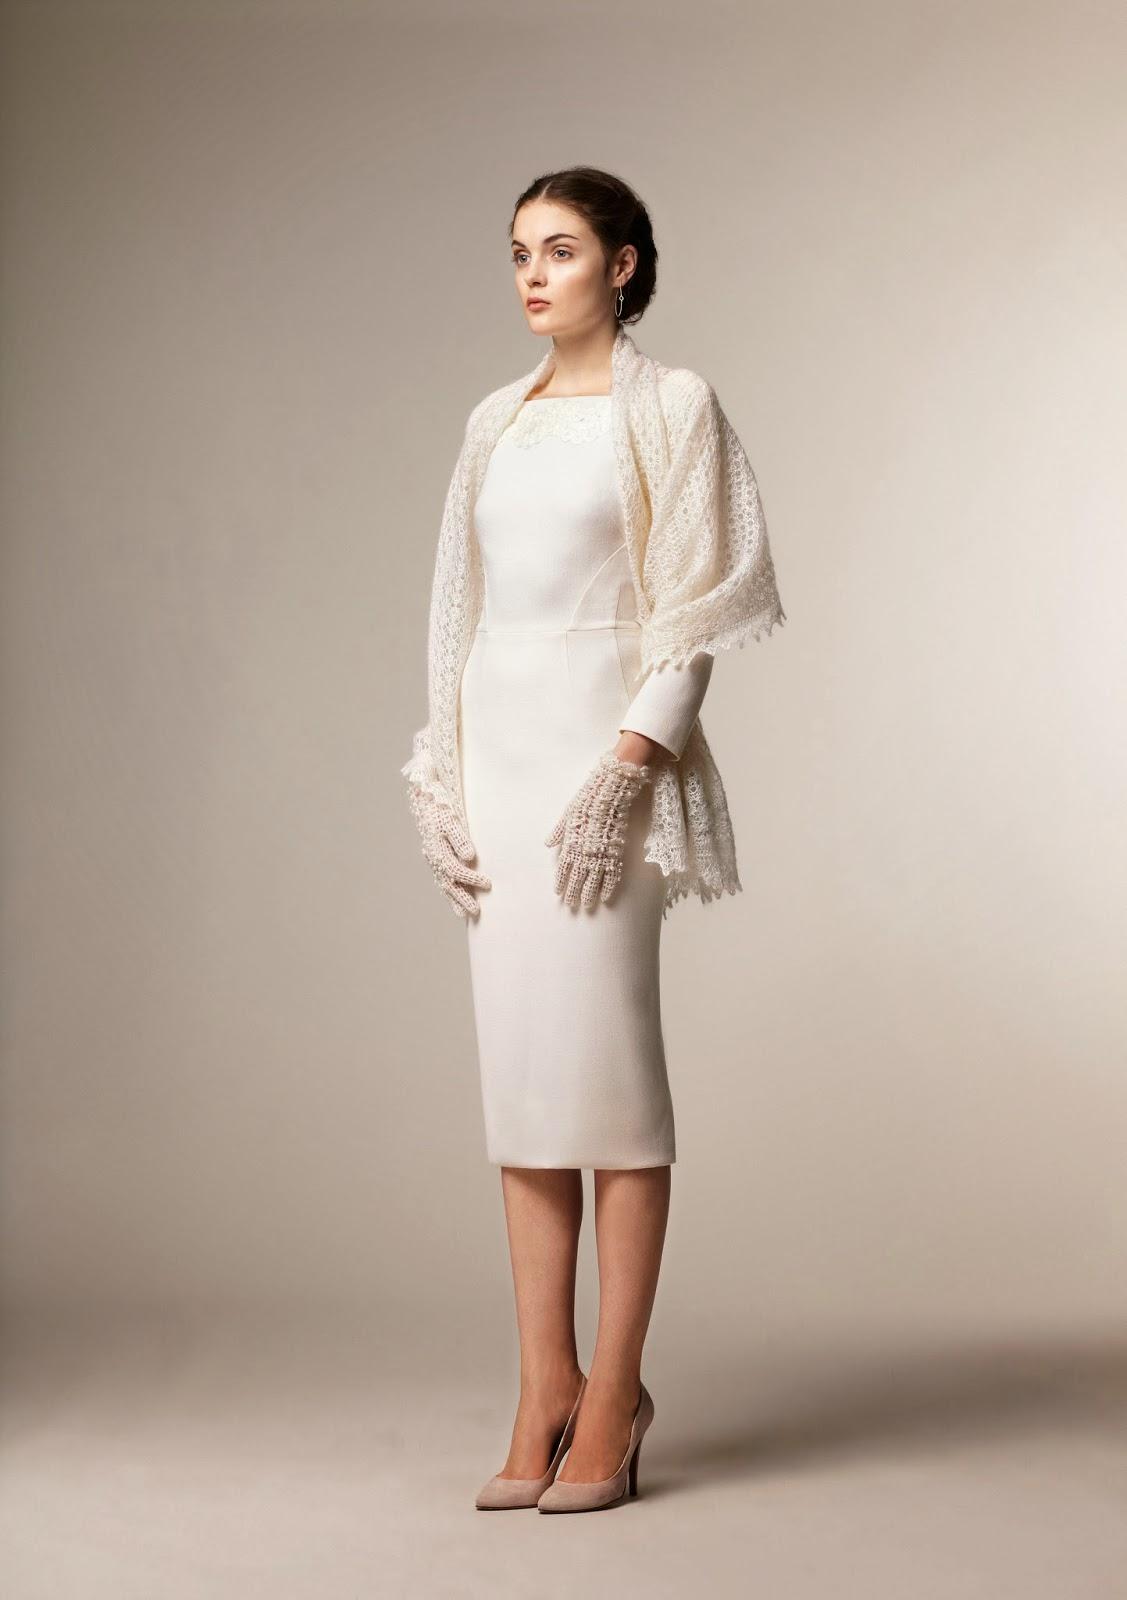 White modest midi dress with sleeves - modest pencil skirt